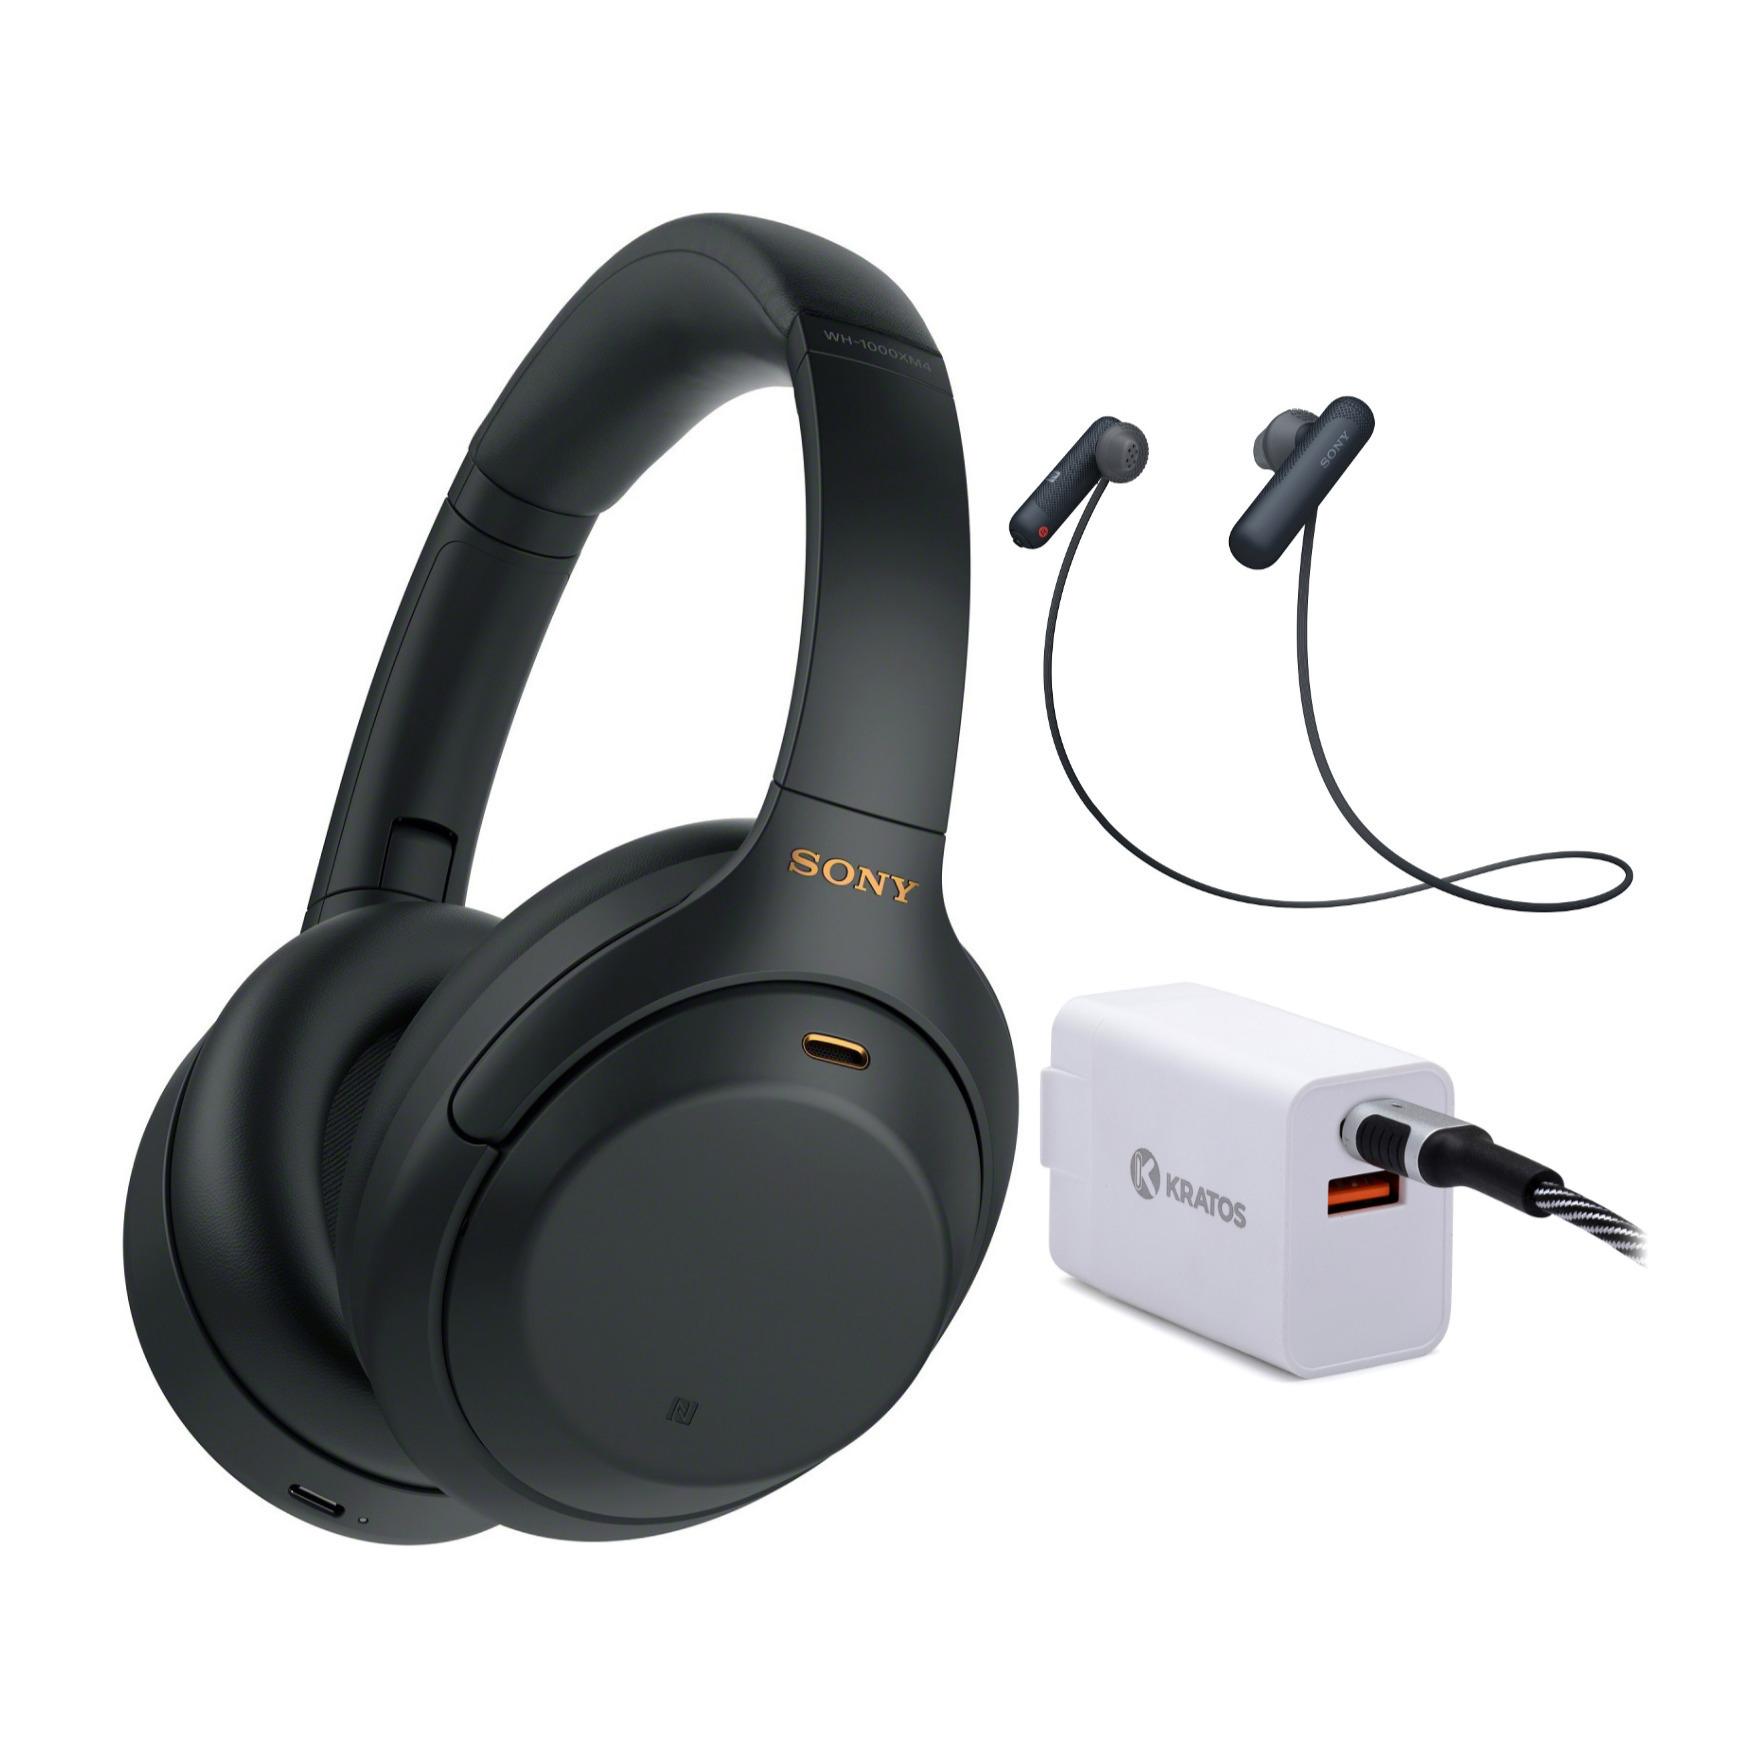 Sony WH-1000XM4 Wireless Noise Canceling Over-Ear Headphones (Black) + Sony WI-SP500 In-Ear Sports Wireless Headphones + 30W PD 2-Port Power Adapter $248 + Free Shipping $243